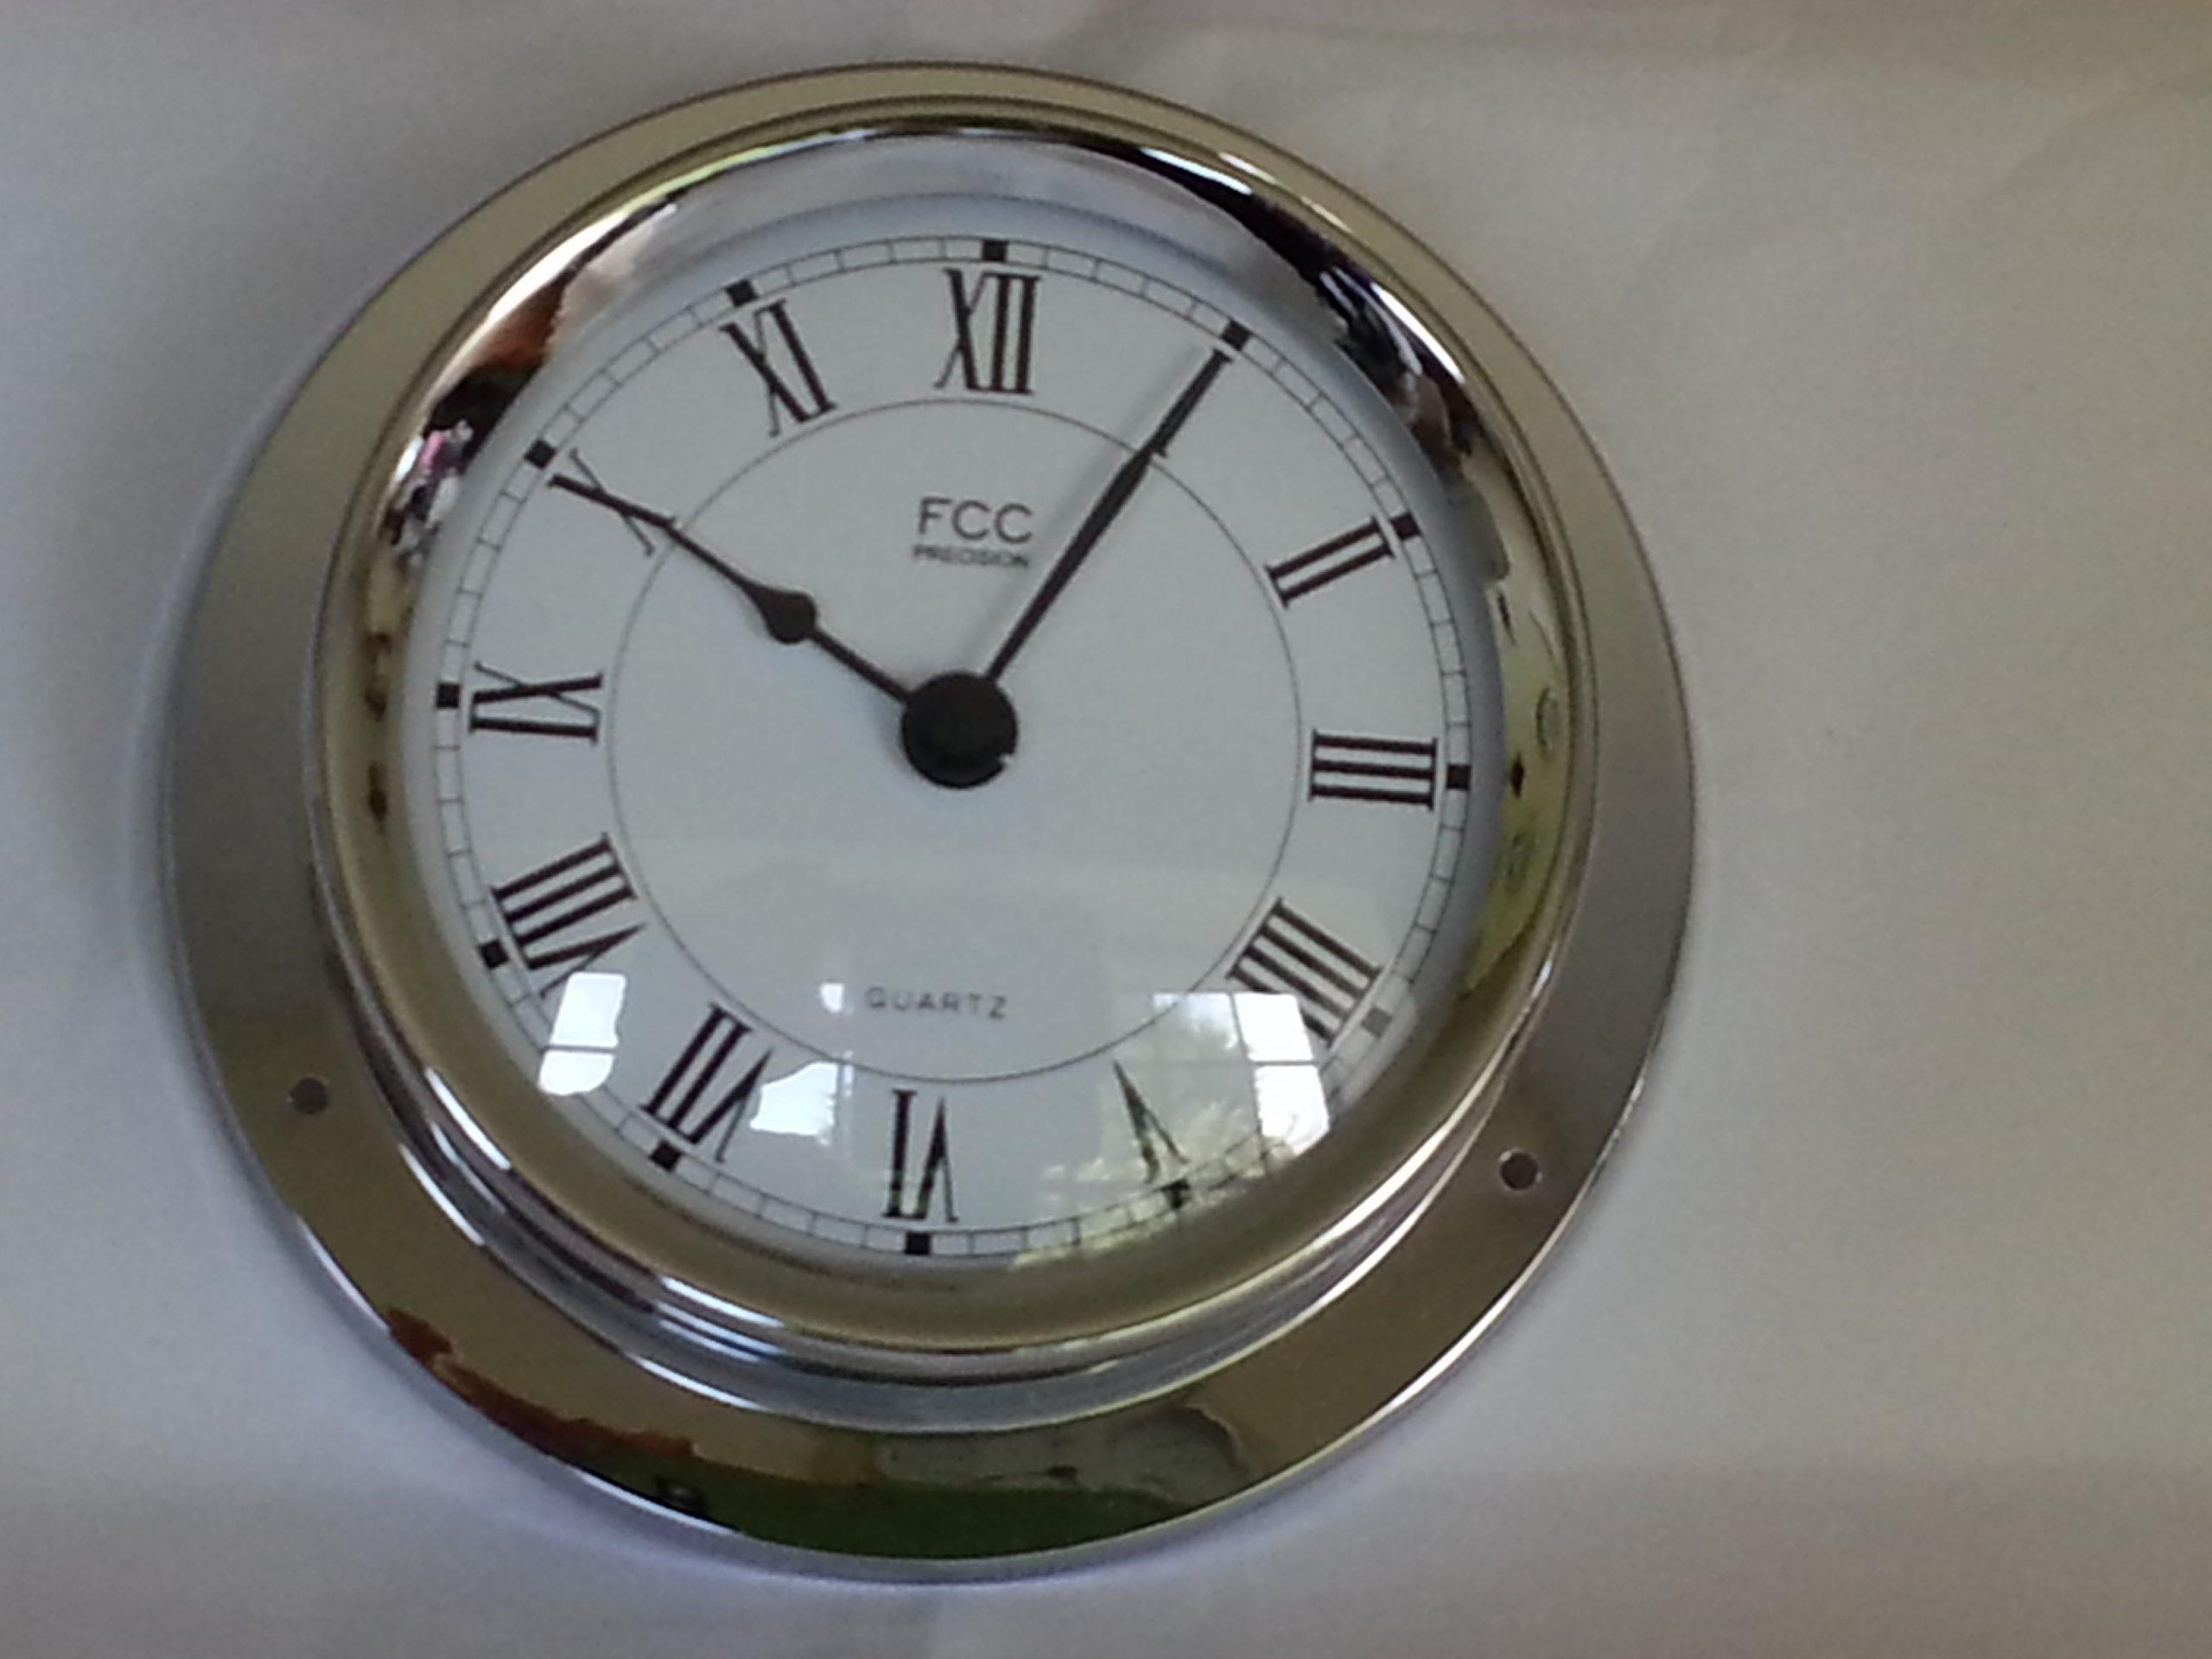 Nautical style chrome clock